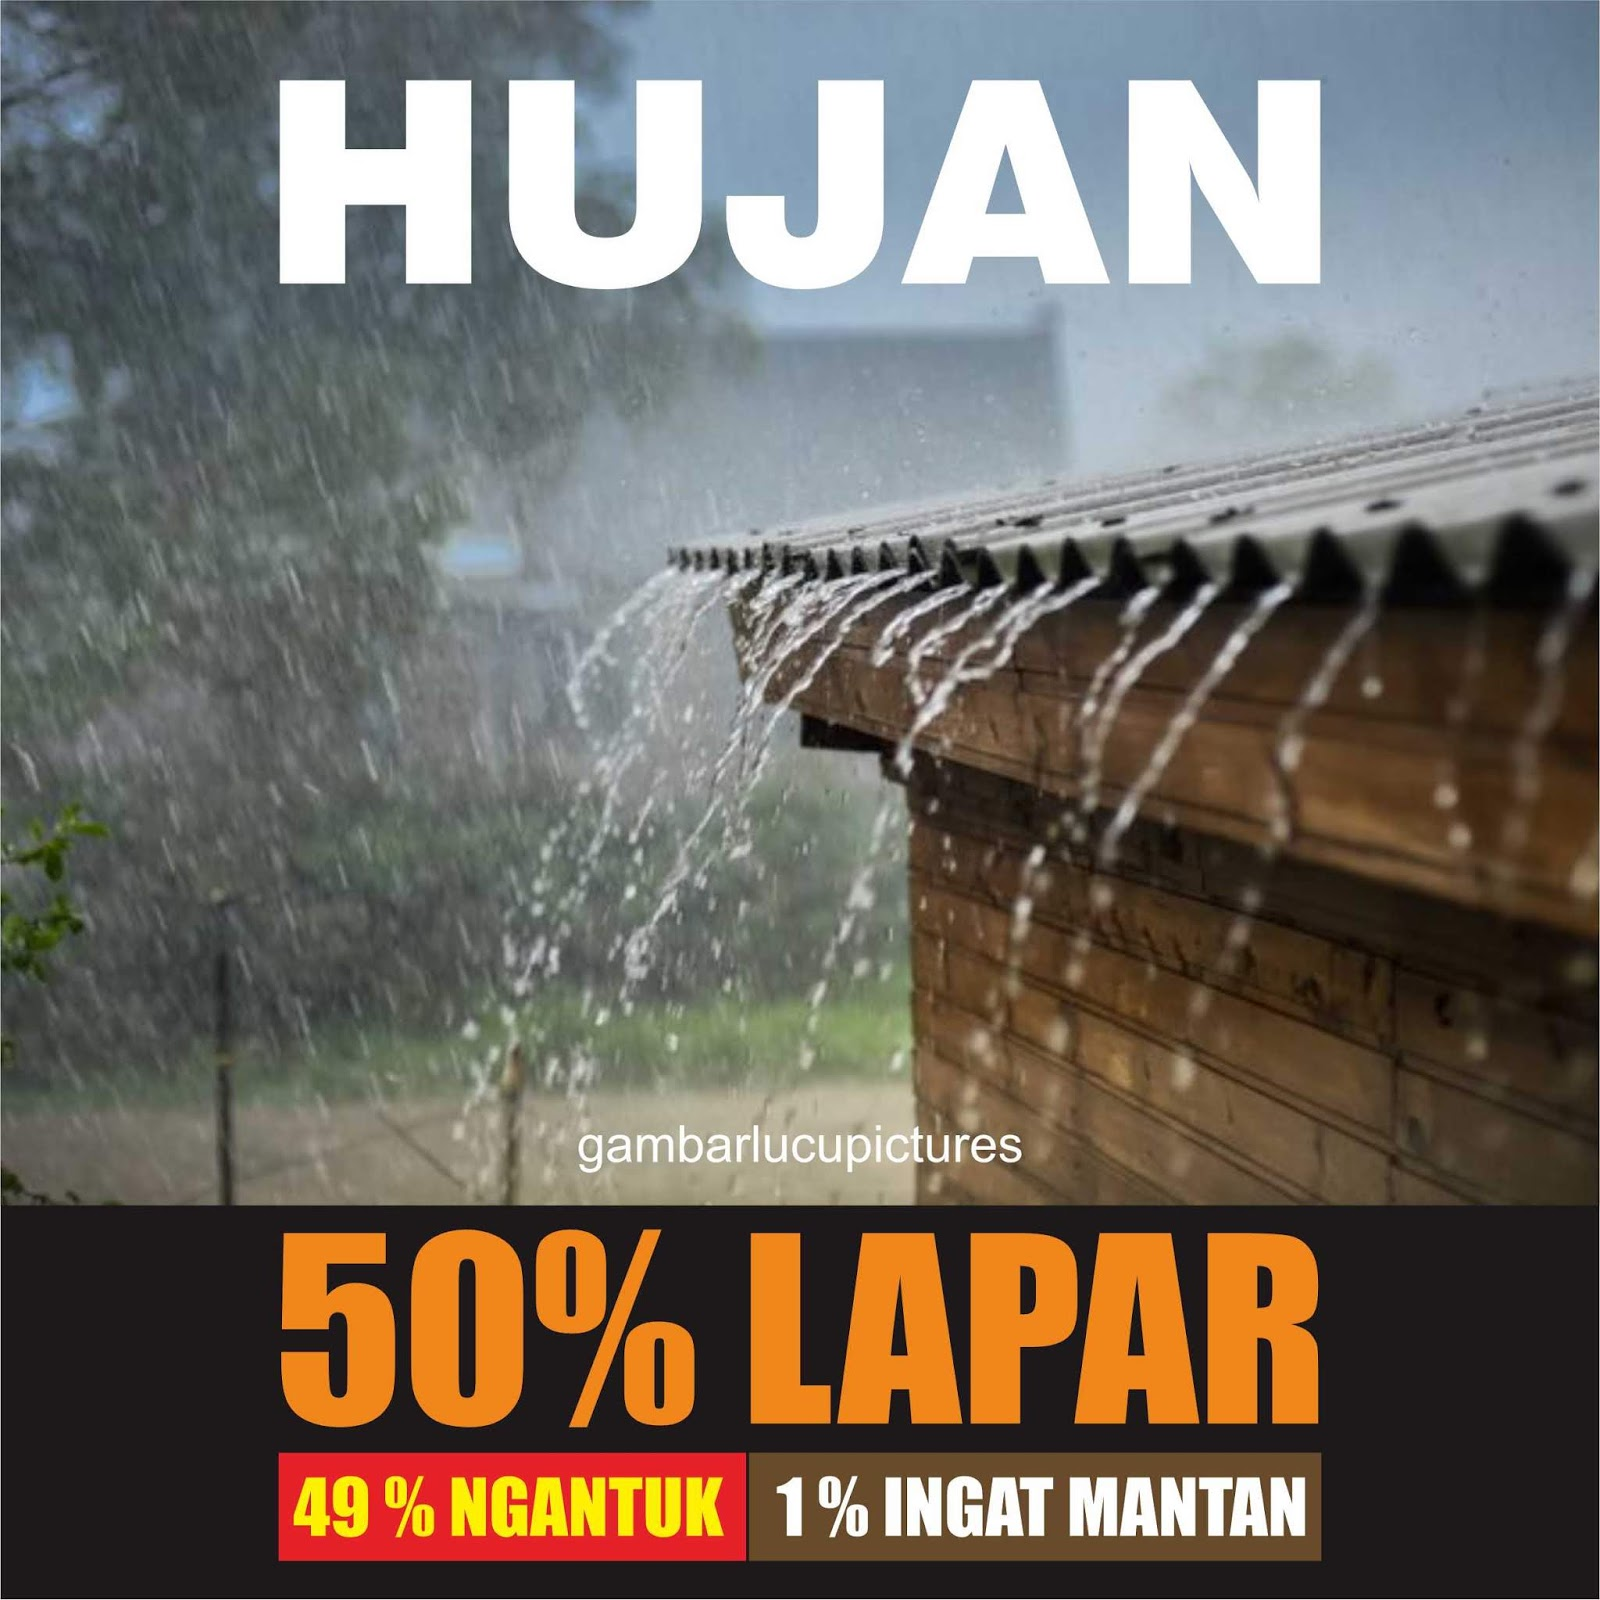 16 Gambar2 Kata Meme Lucu Saat Hujan Turun Gambar Lucu Terbaru